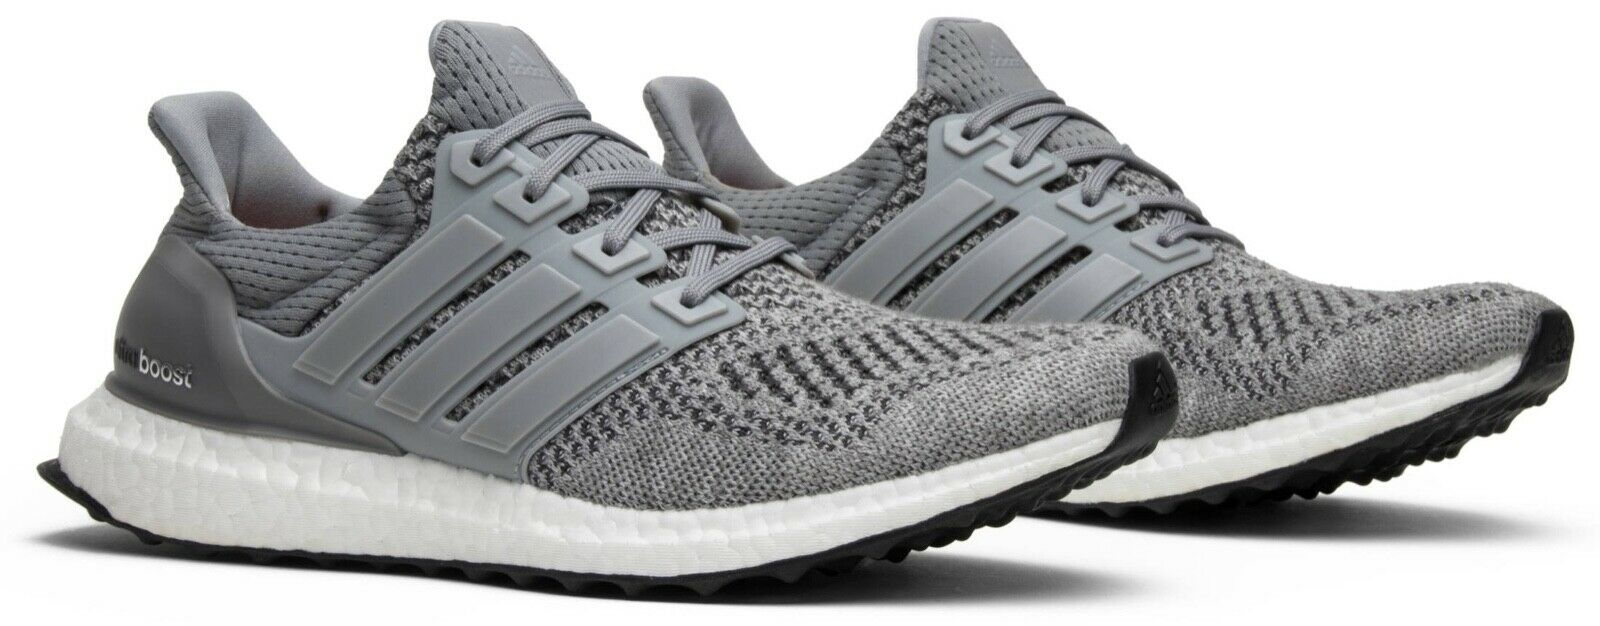 adidas UltraBoost 1.0 Wool Grey 2015